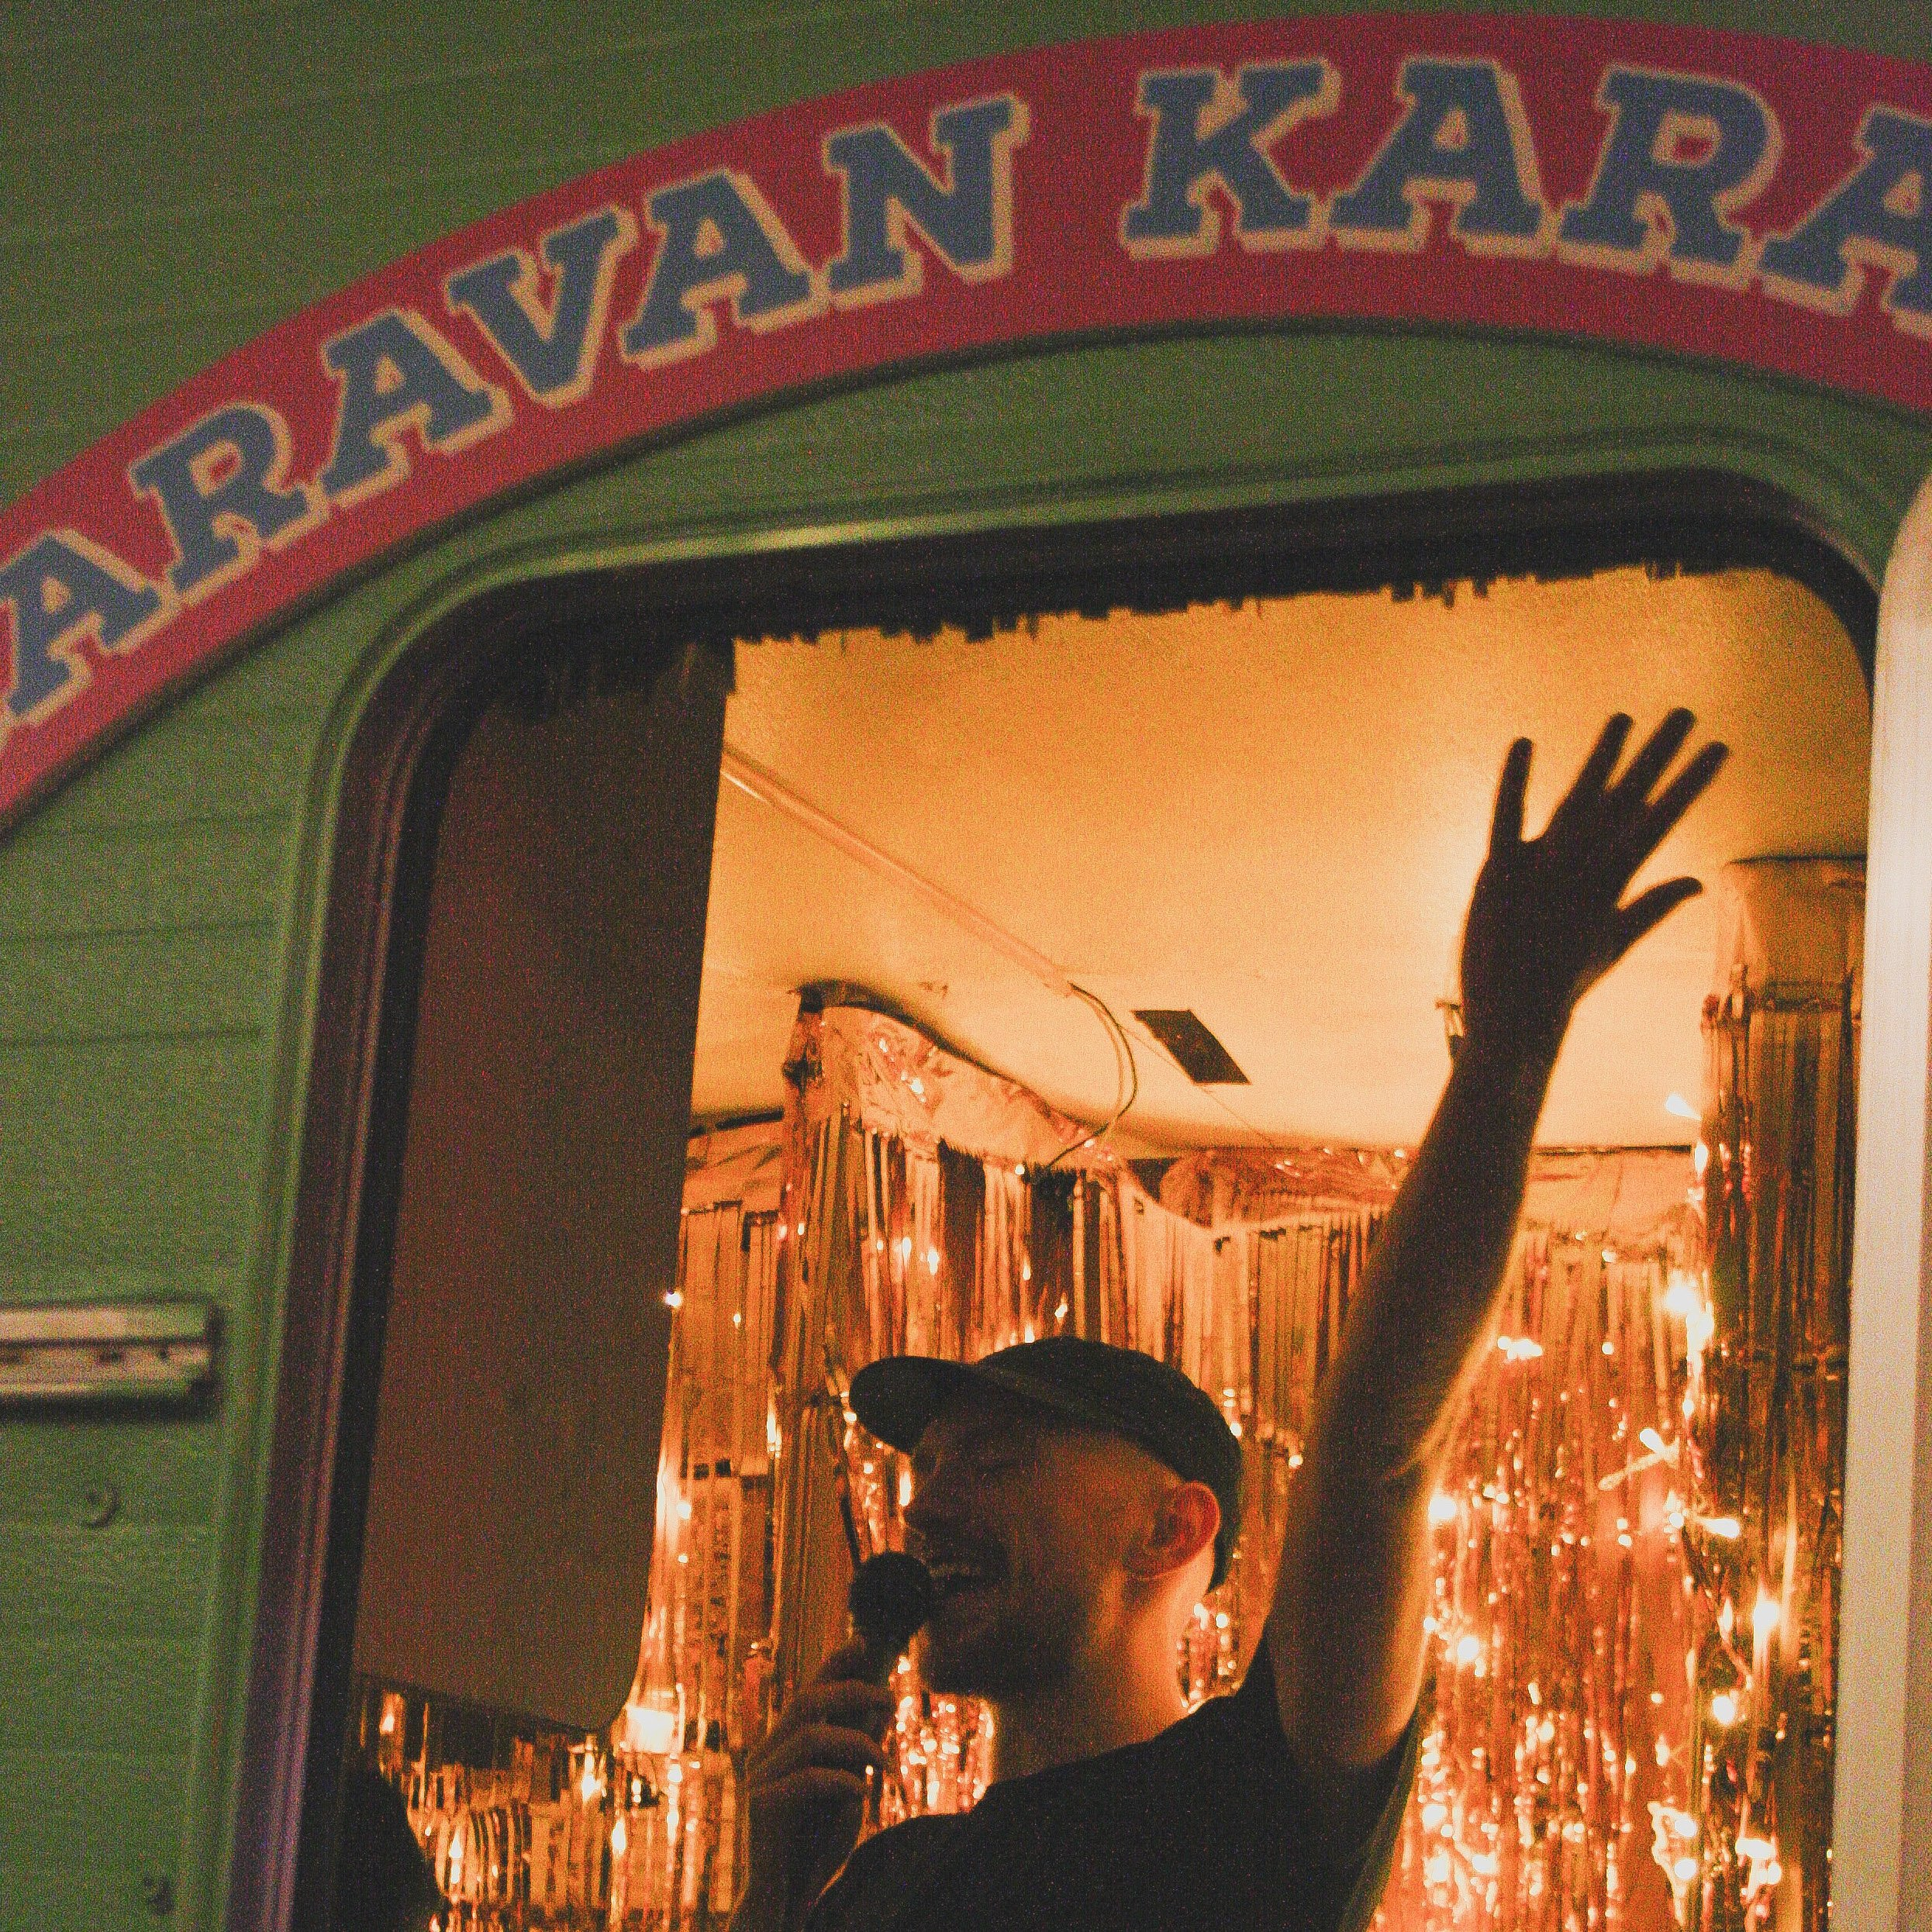 Caravan Karaoke Eatyard